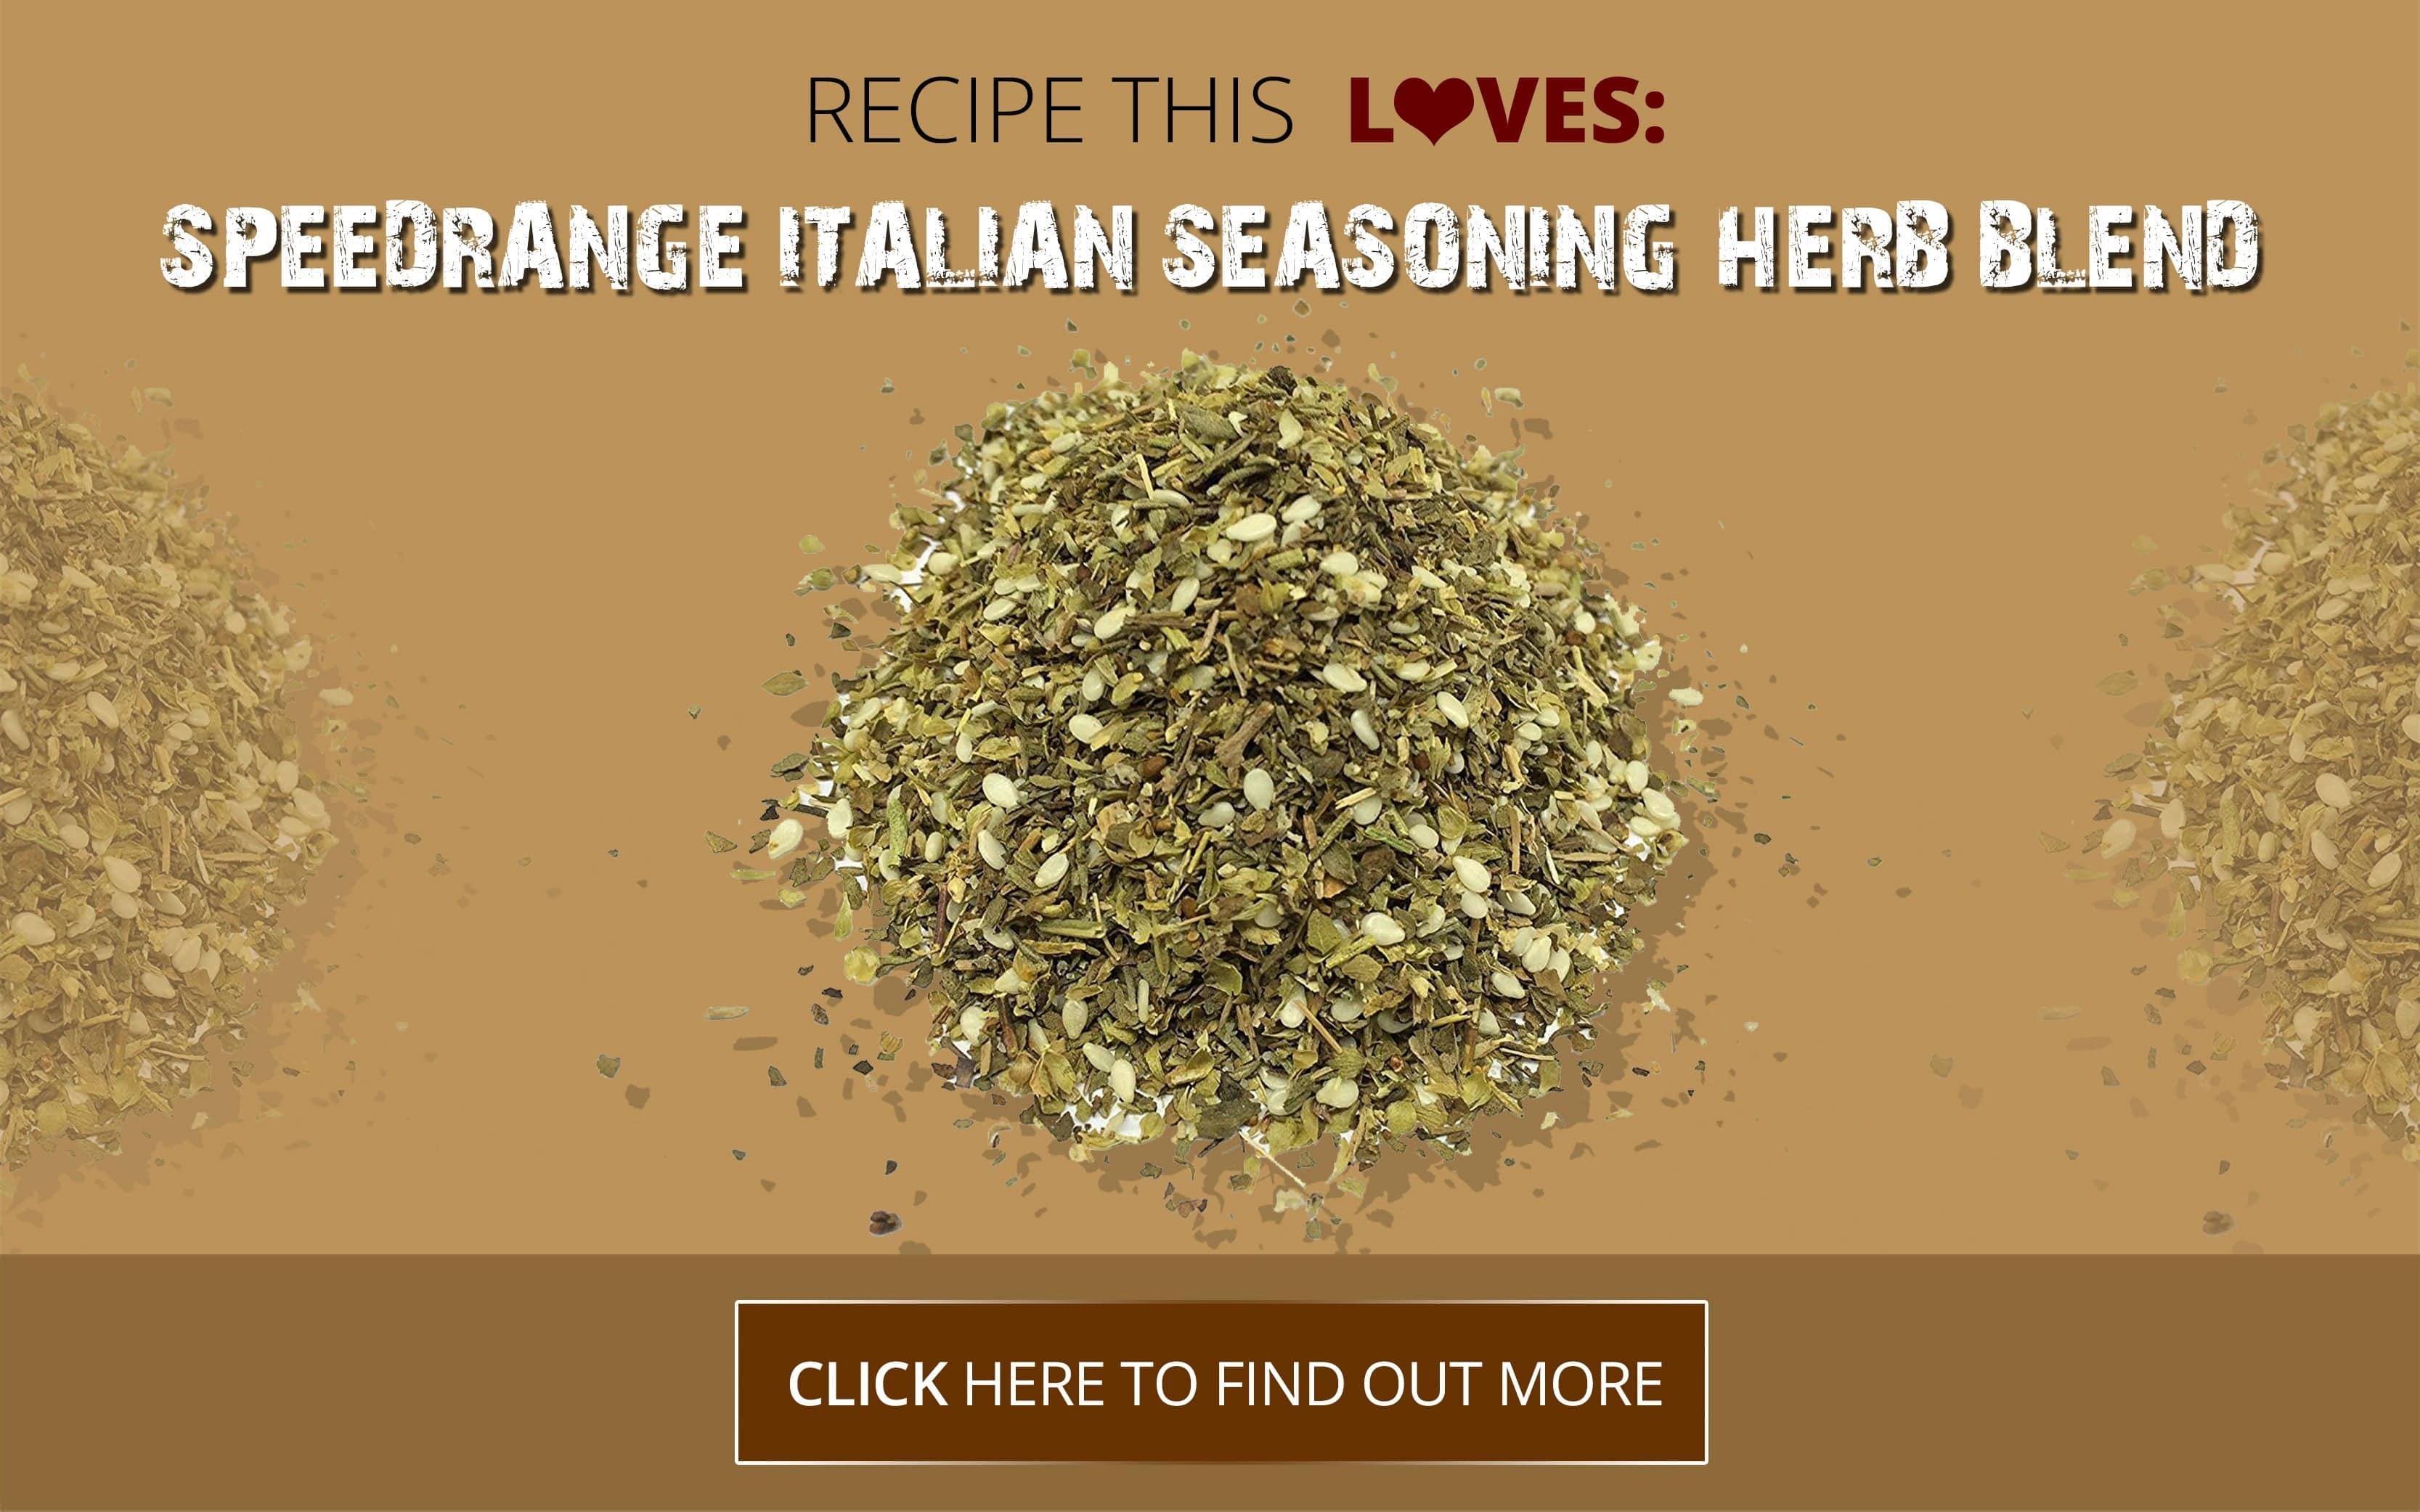 Marketplace | Discover why RecipeThis.com loves Speedrange Italian Seasoning Herb Blend.